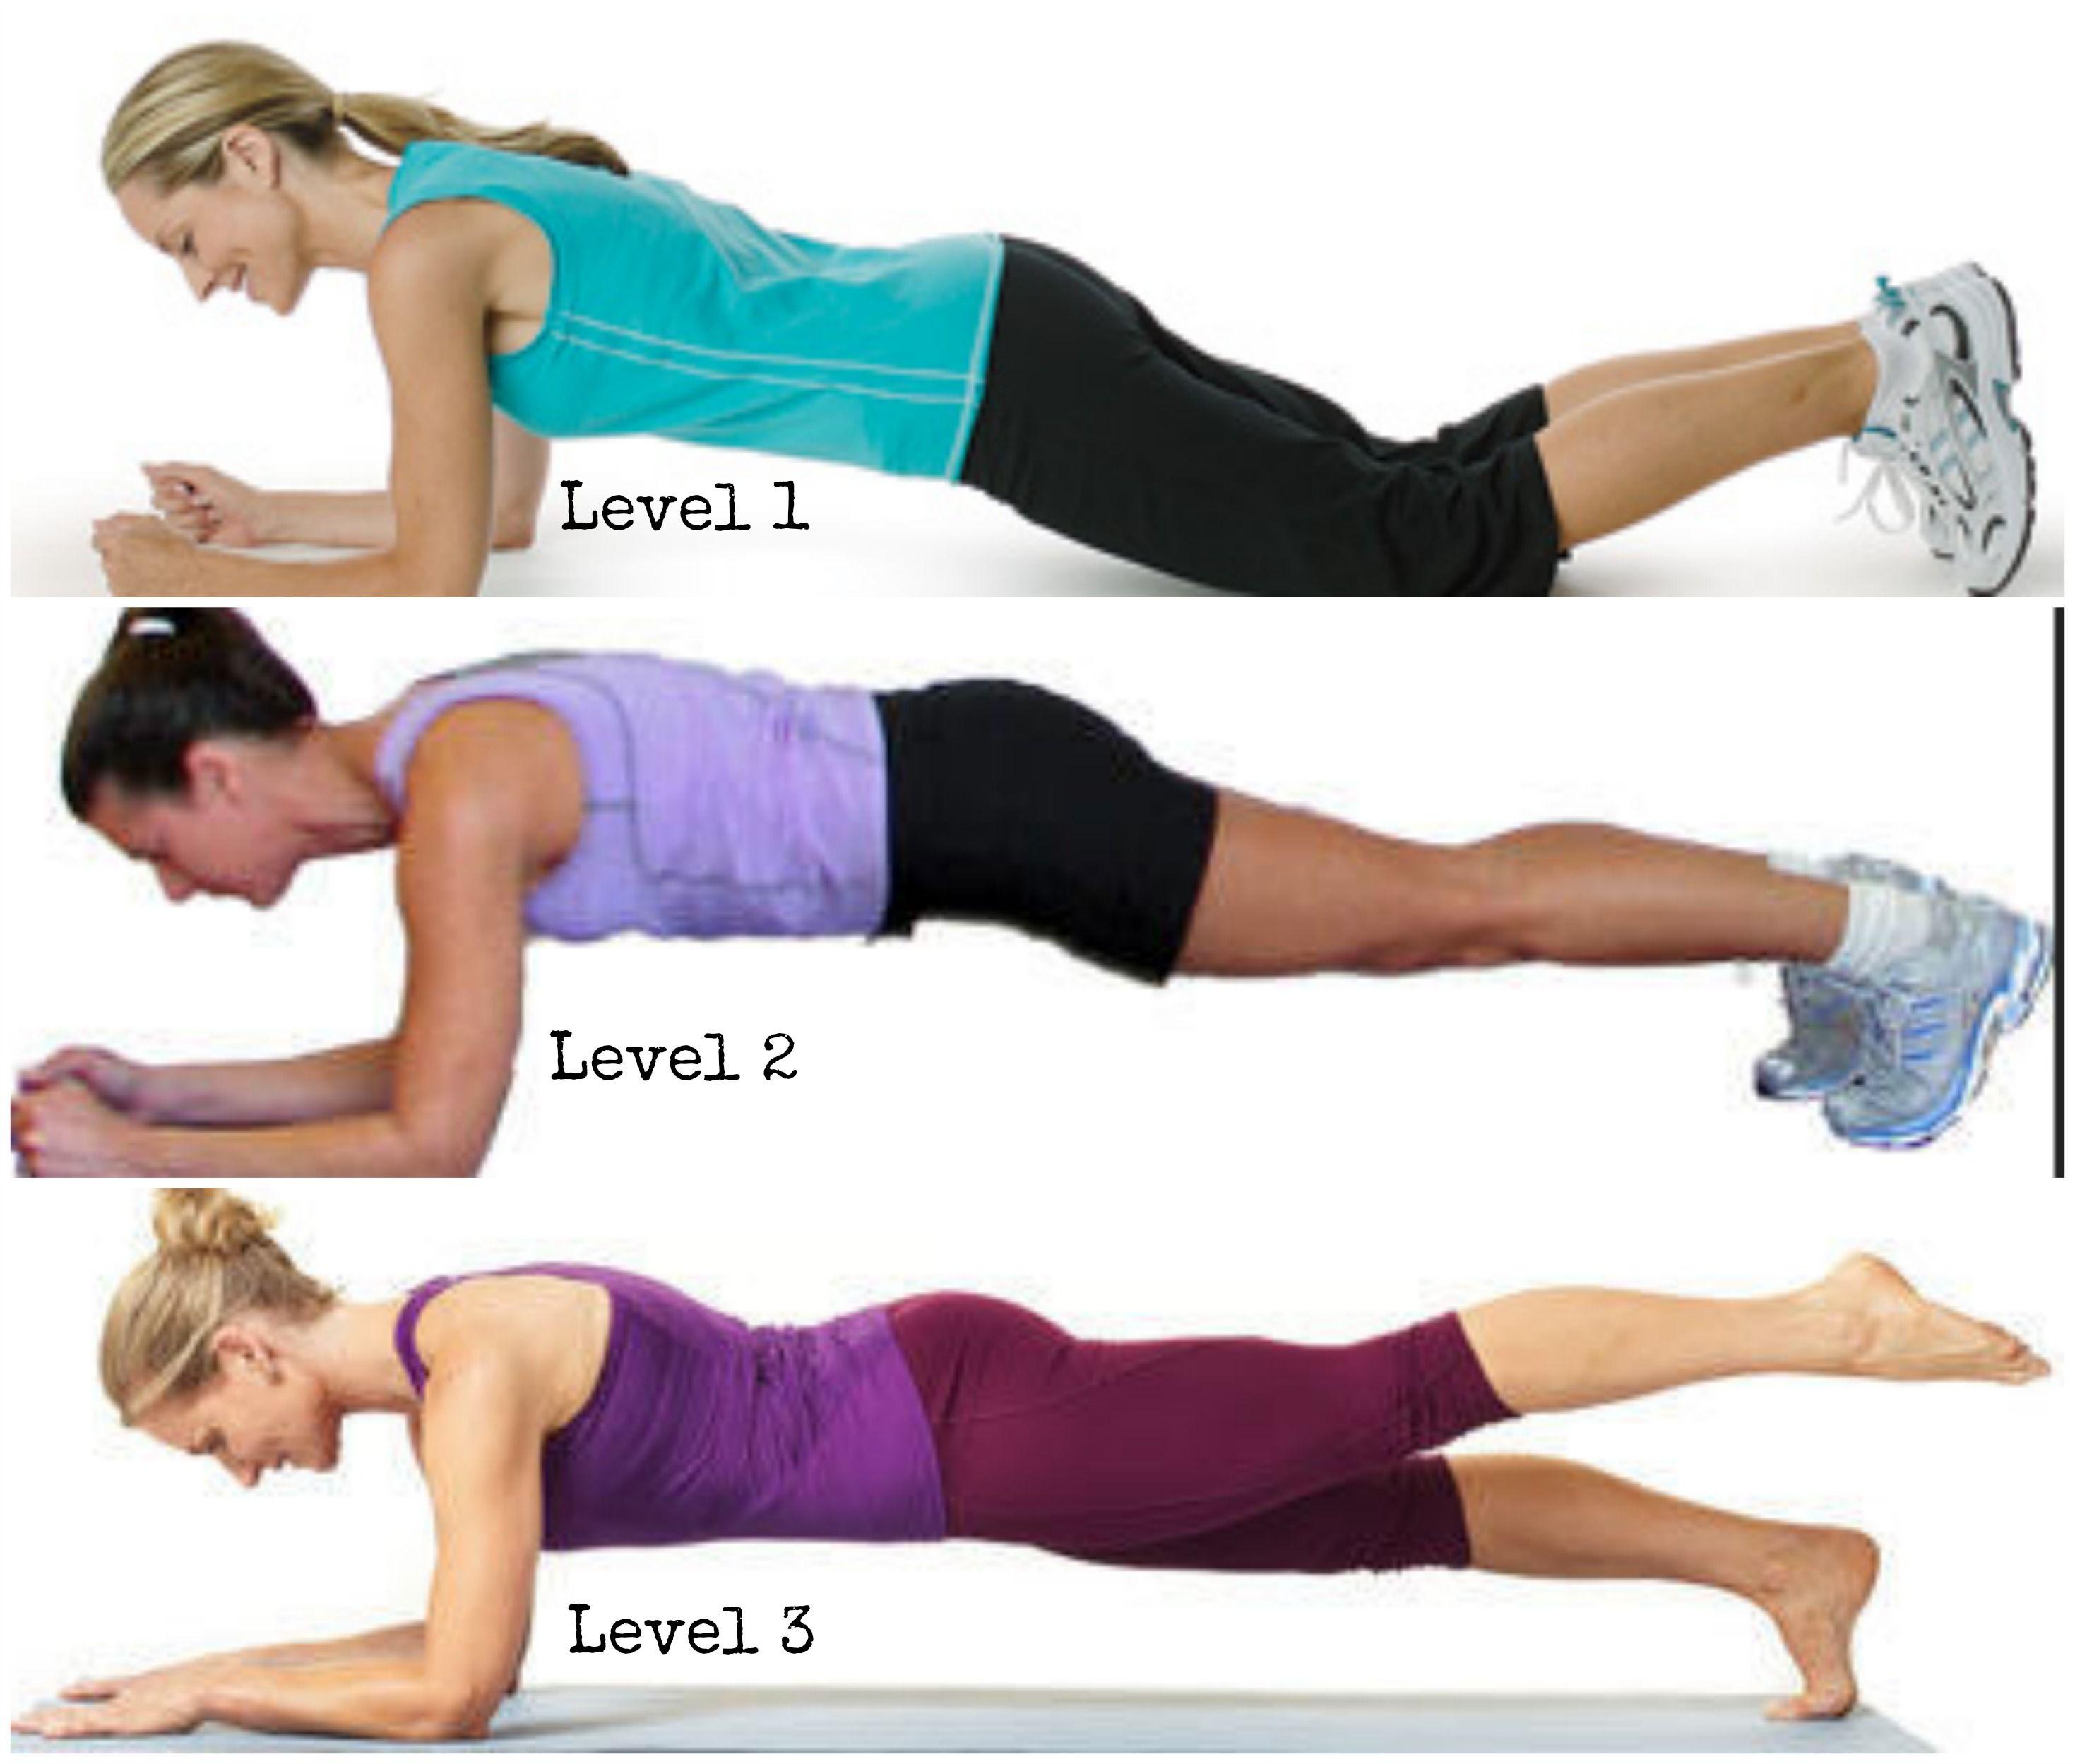 Beginner Workout 20 Plus Pound Weight Loss Routine